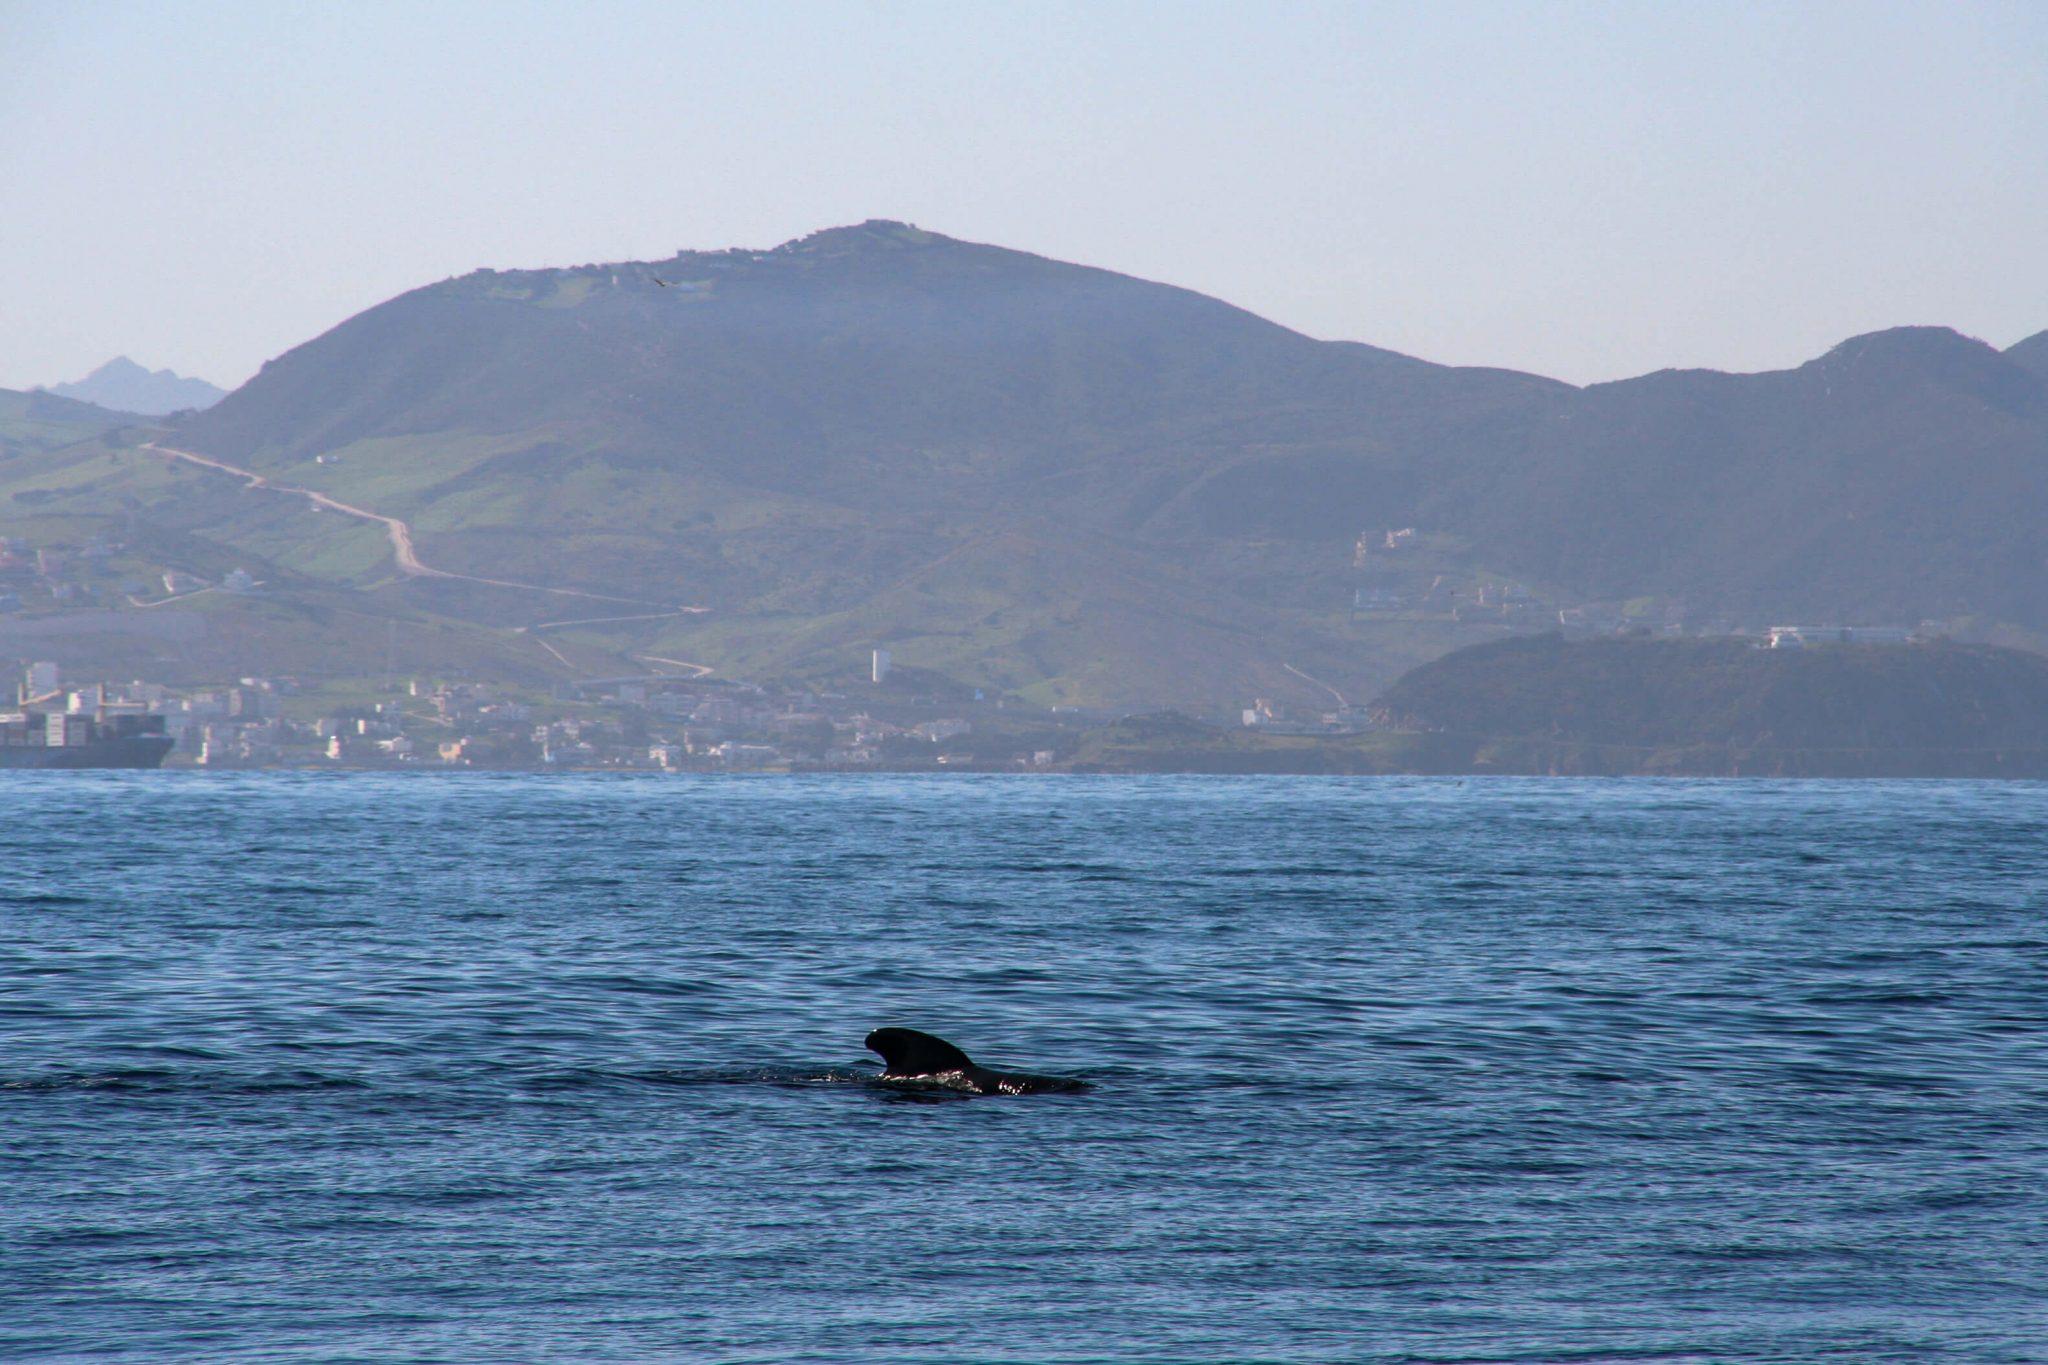 ale-delfine-spanien-whale-watching-tarifa-firmm 10